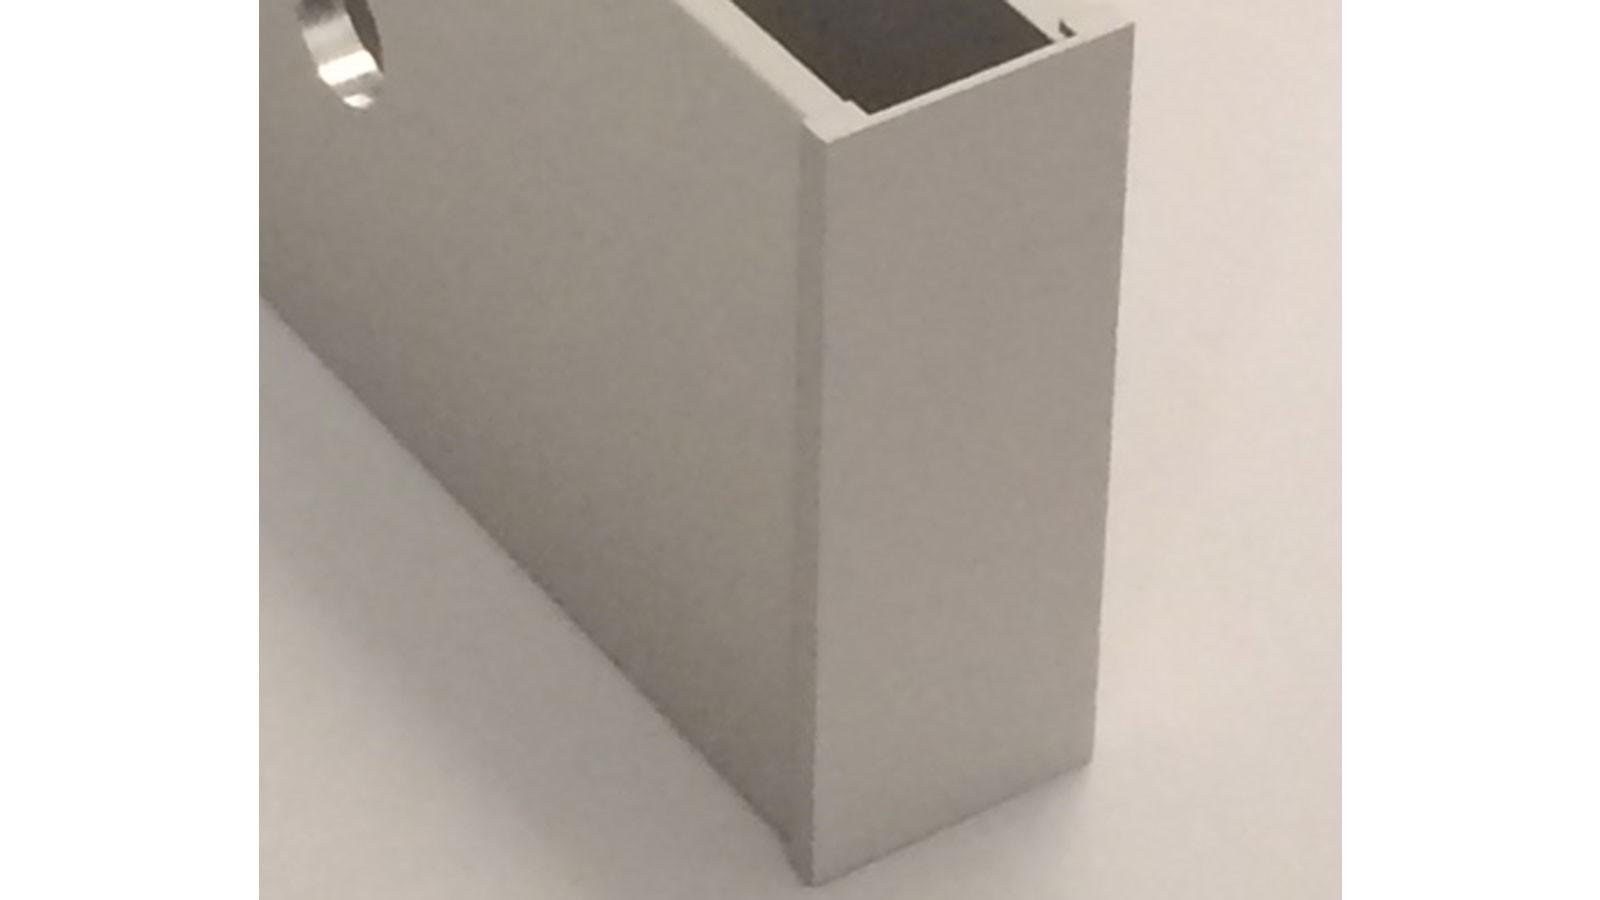 ganzglasgel nder endkappe rechts aluminium silber eloxiert passend zu profil 10 3000 202 11. Black Bedroom Furniture Sets. Home Design Ideas